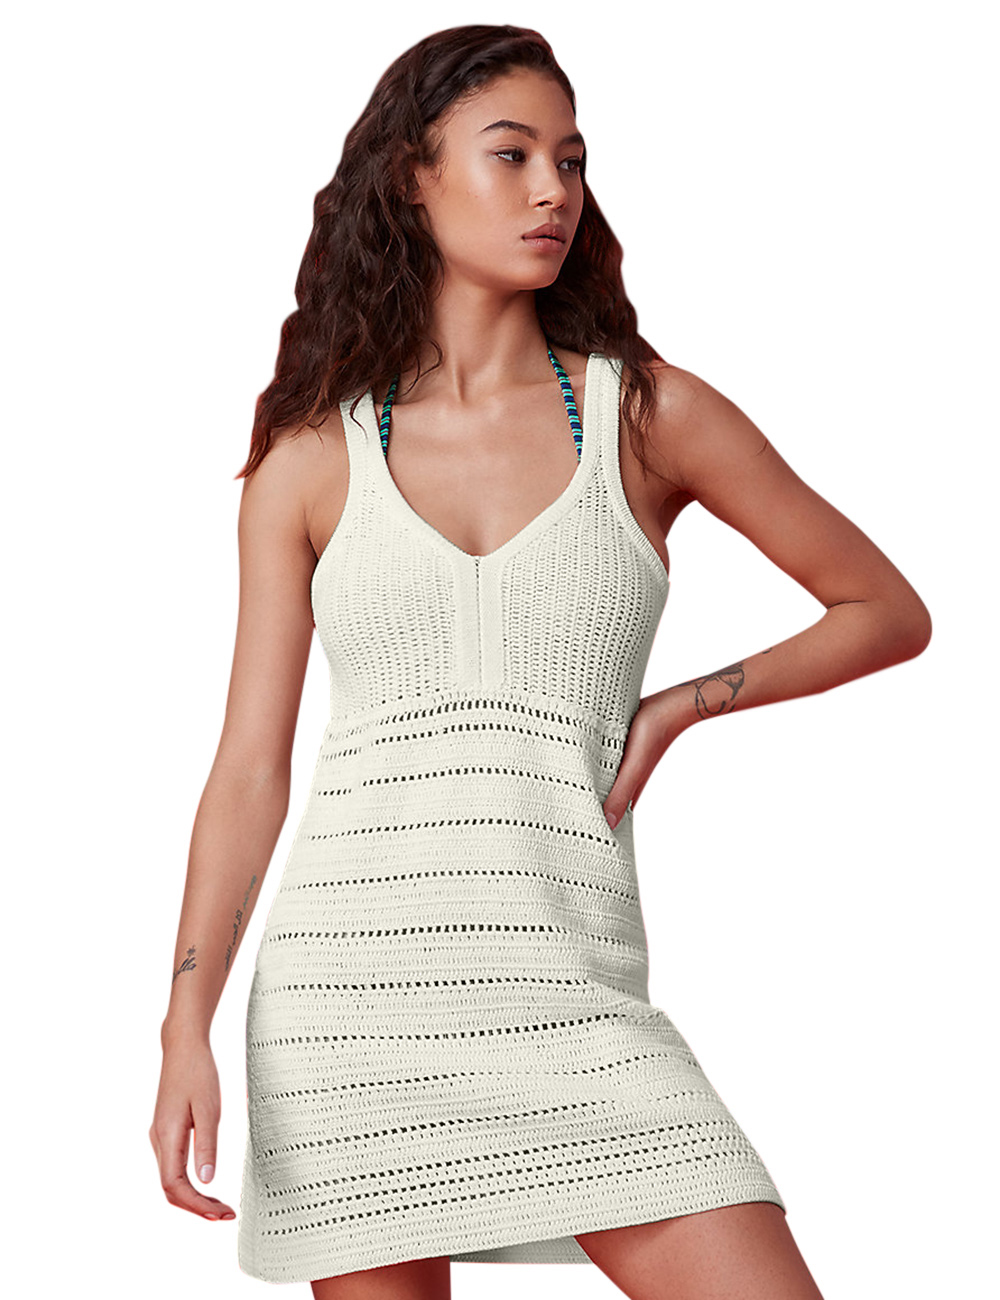 Brand good the beach dress is bodycon a on what curvy asda lulus